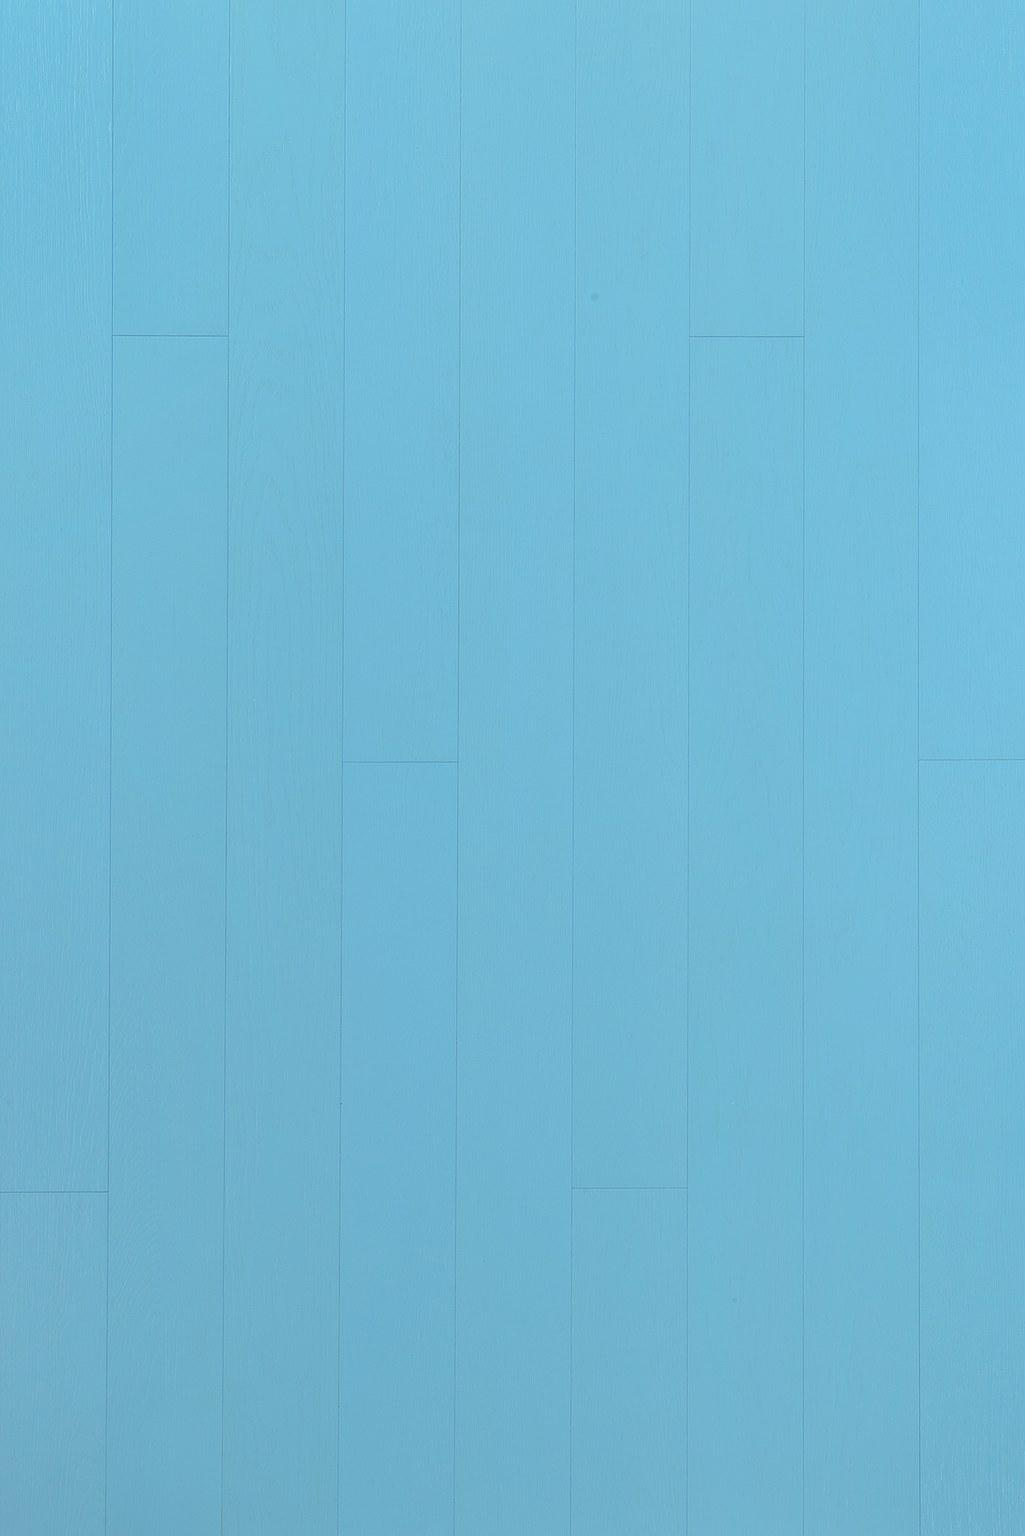 Timberwise parketti lankkuparketti puulattia wooden floor parquet plank Tammi Oak Baby Blue_2D1